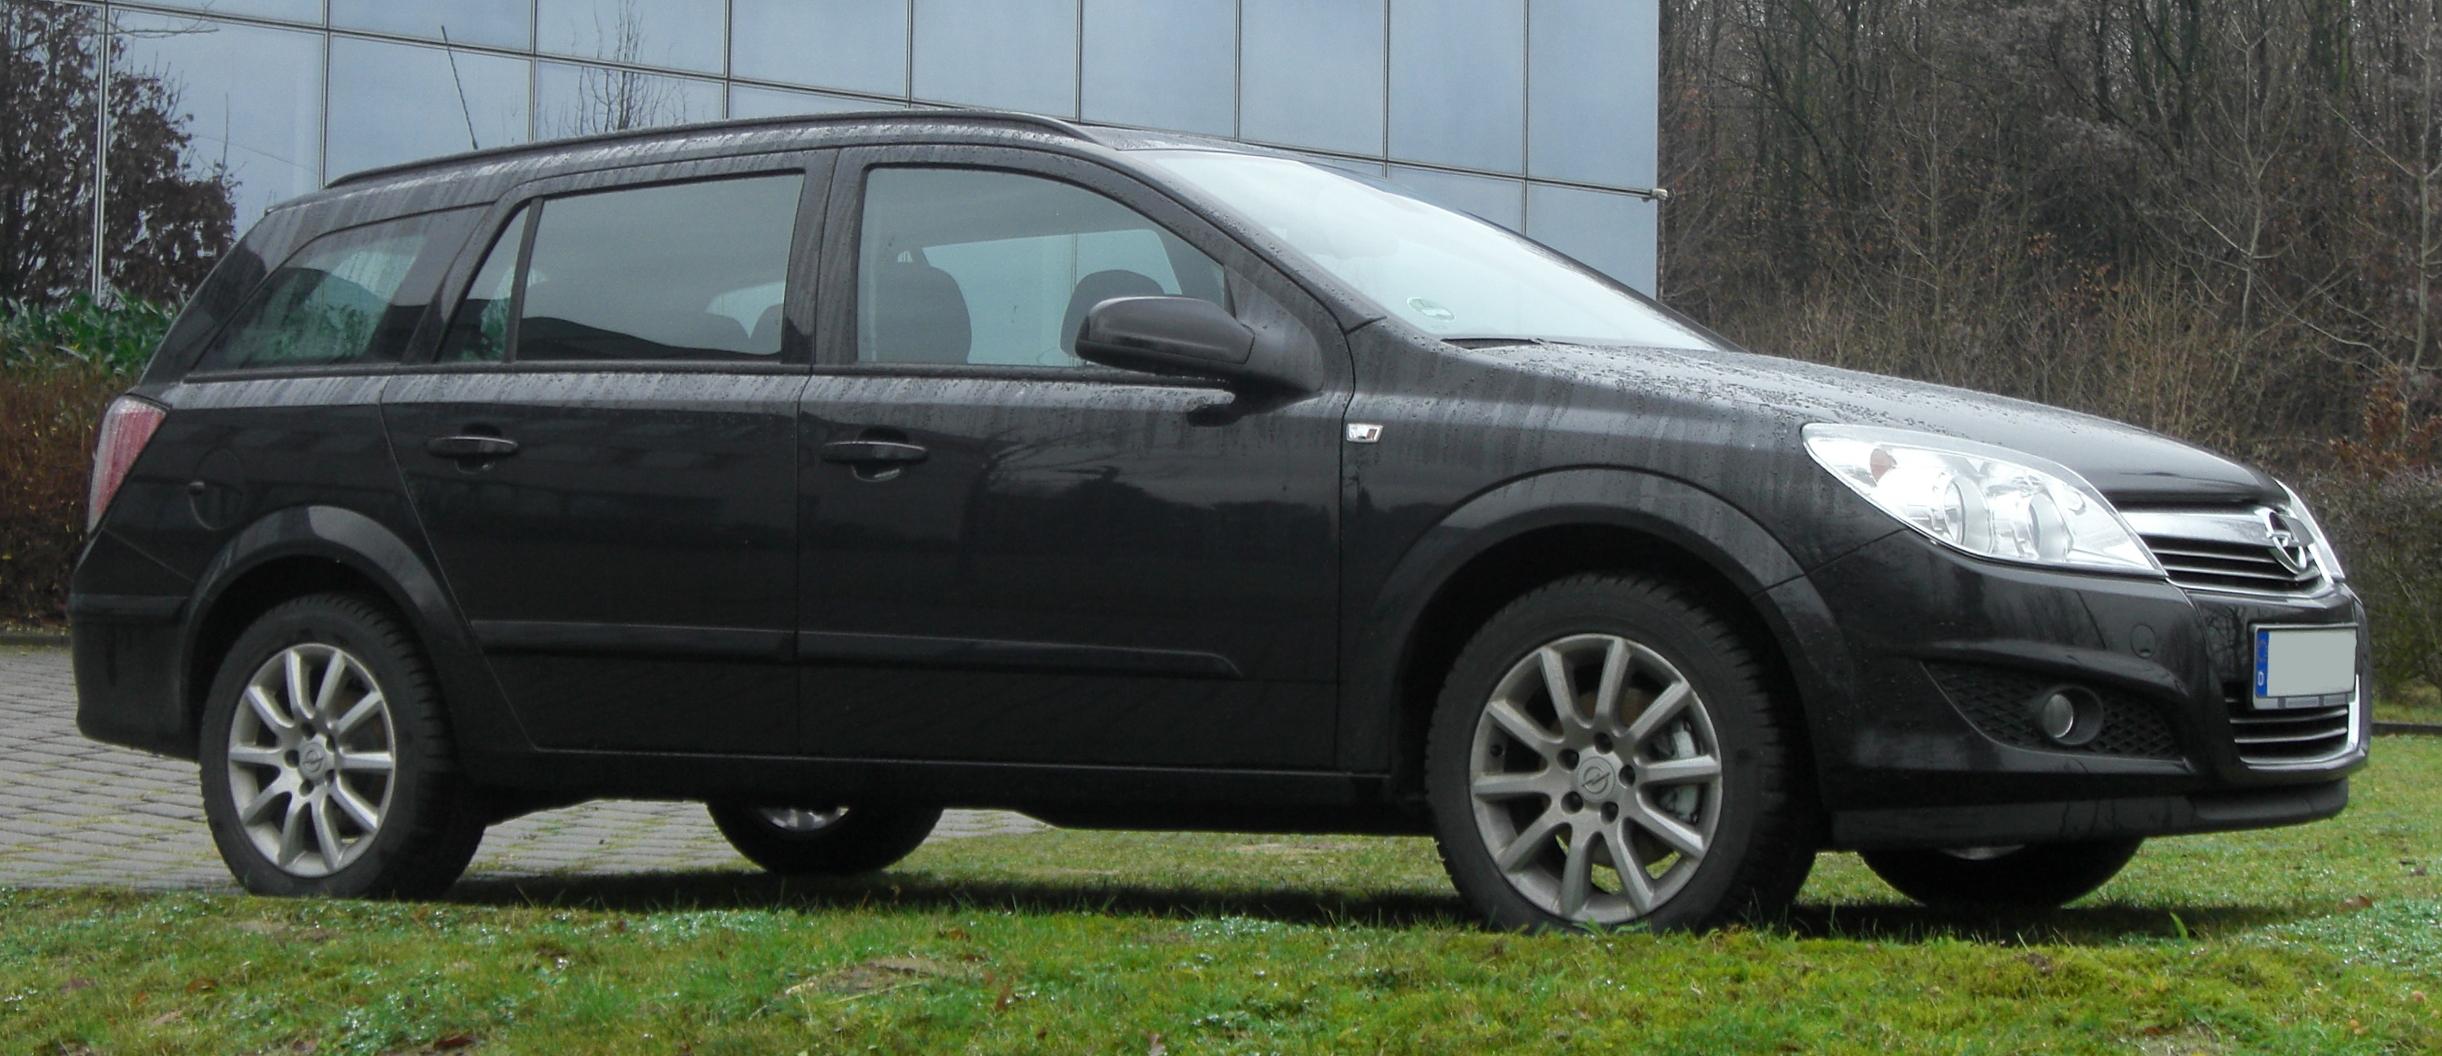 Opel Astra h Caravan Facelift